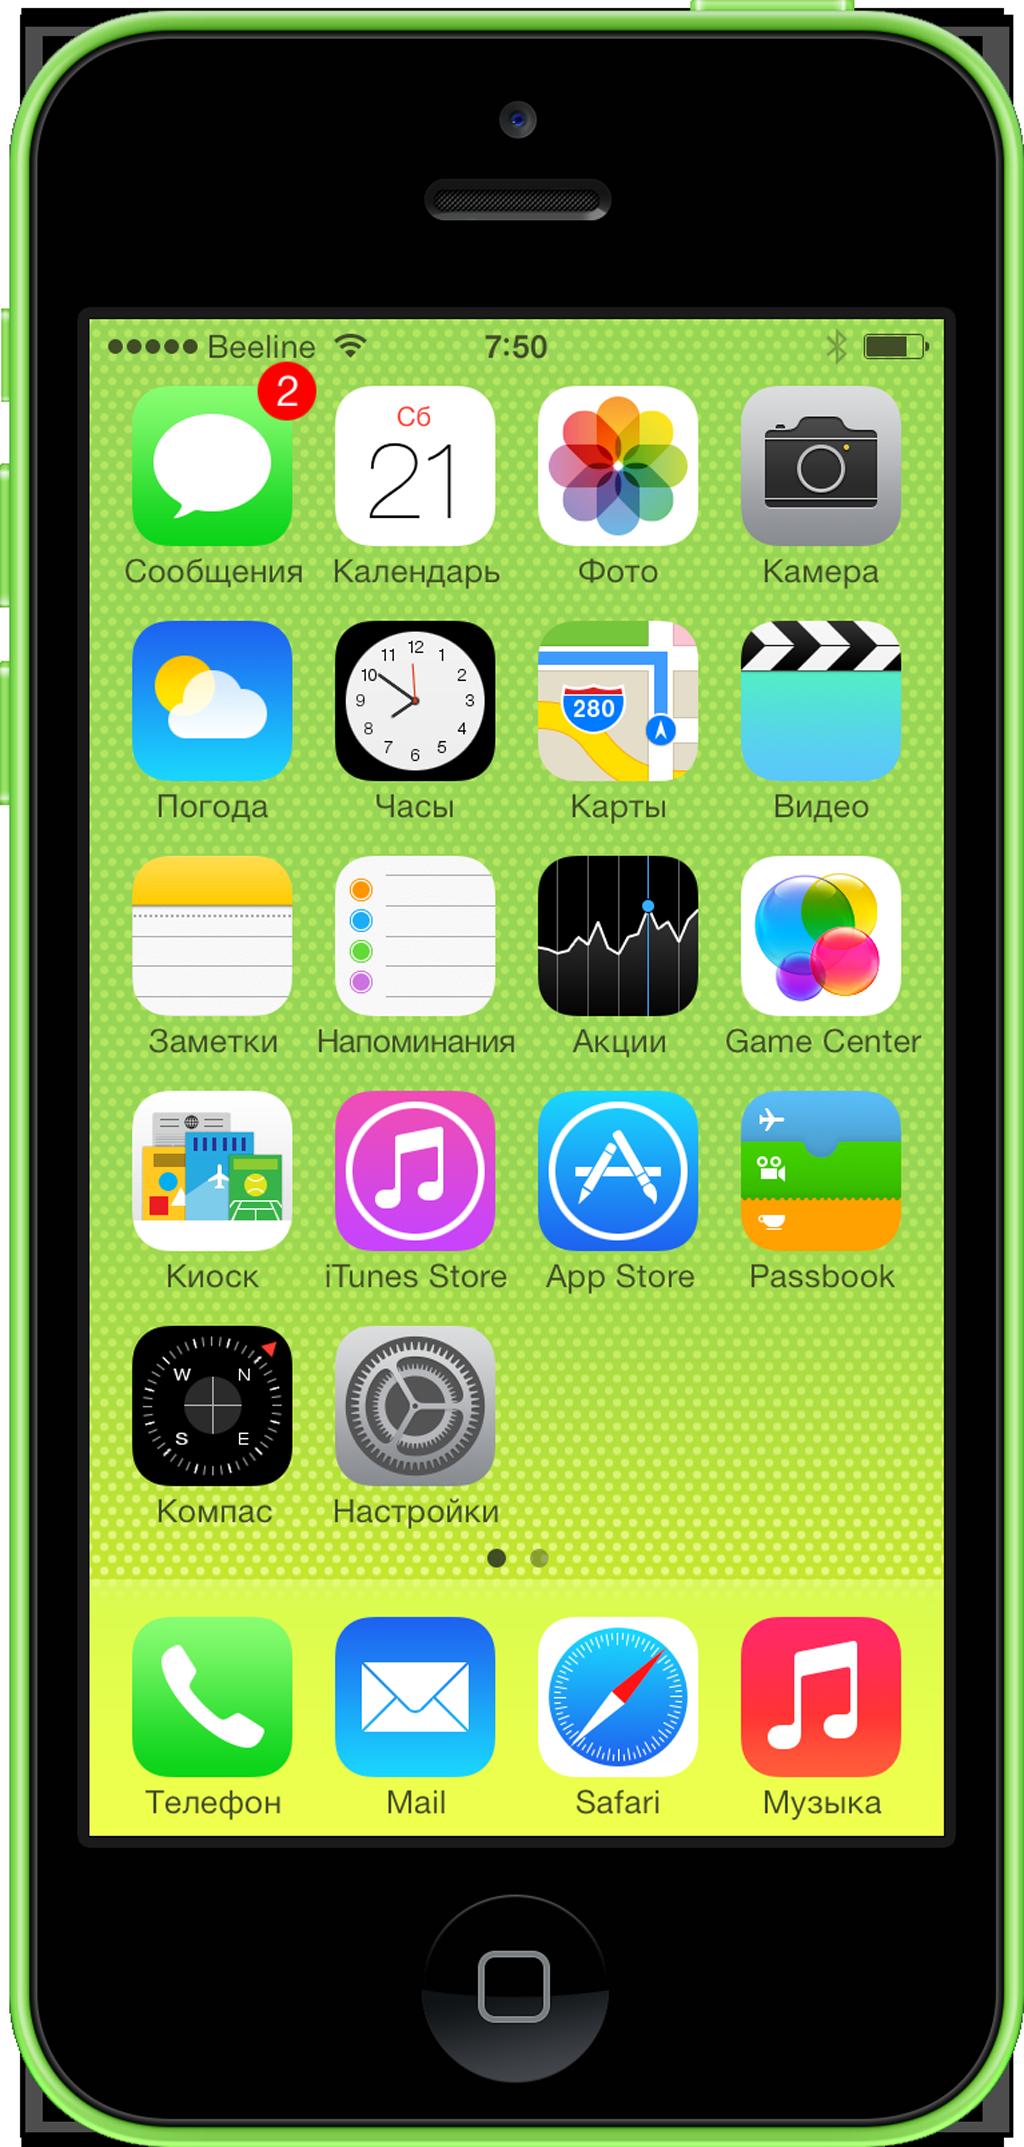 Ремонт iPhone 3G - фото 21 | Сервисный центр Total Apple